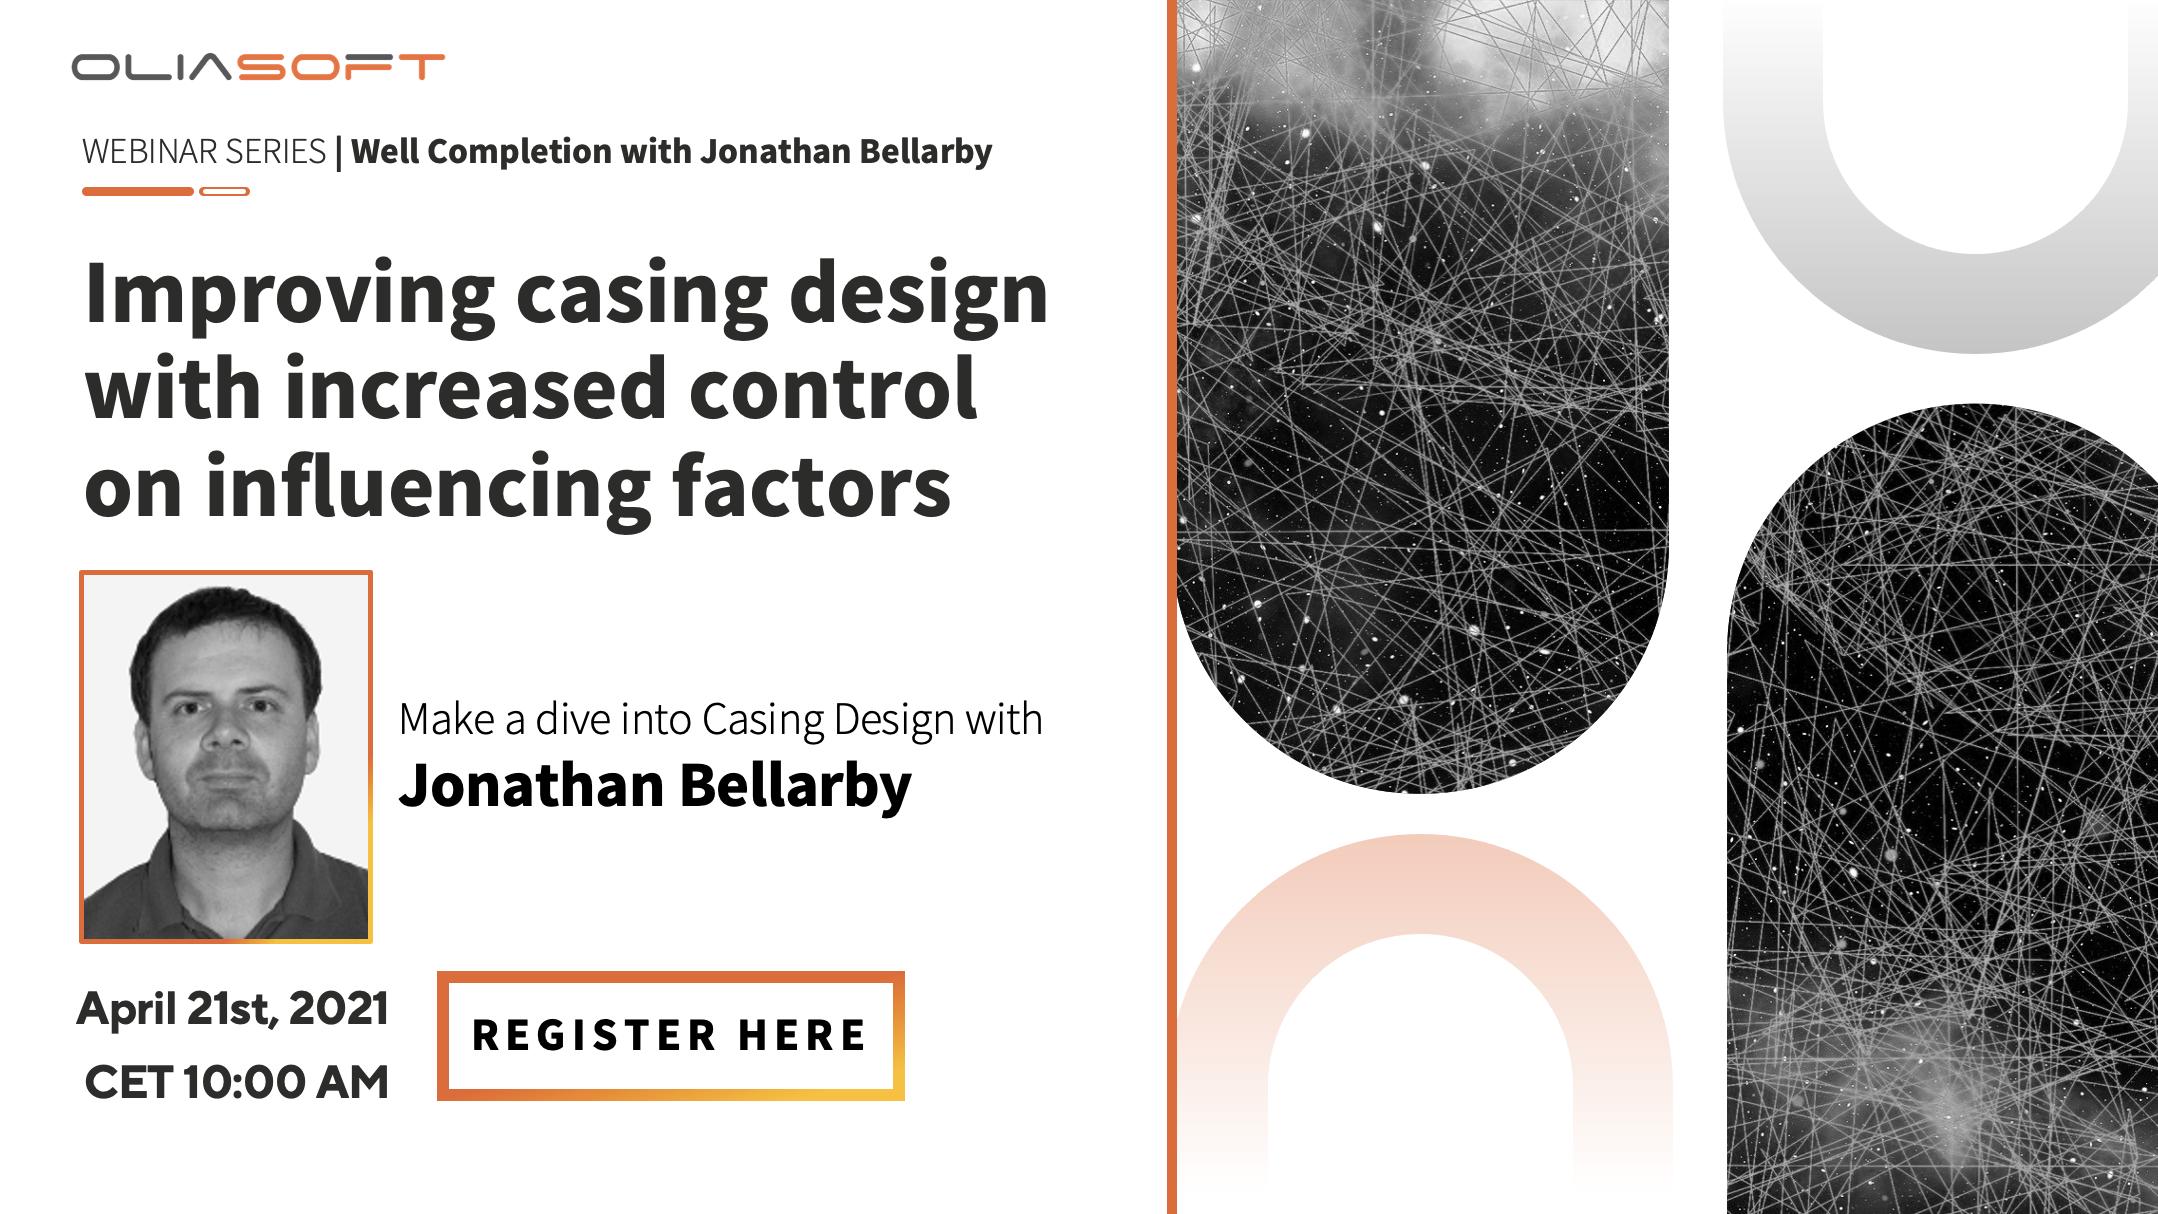 Webinar Series with Jonathan Bellarby